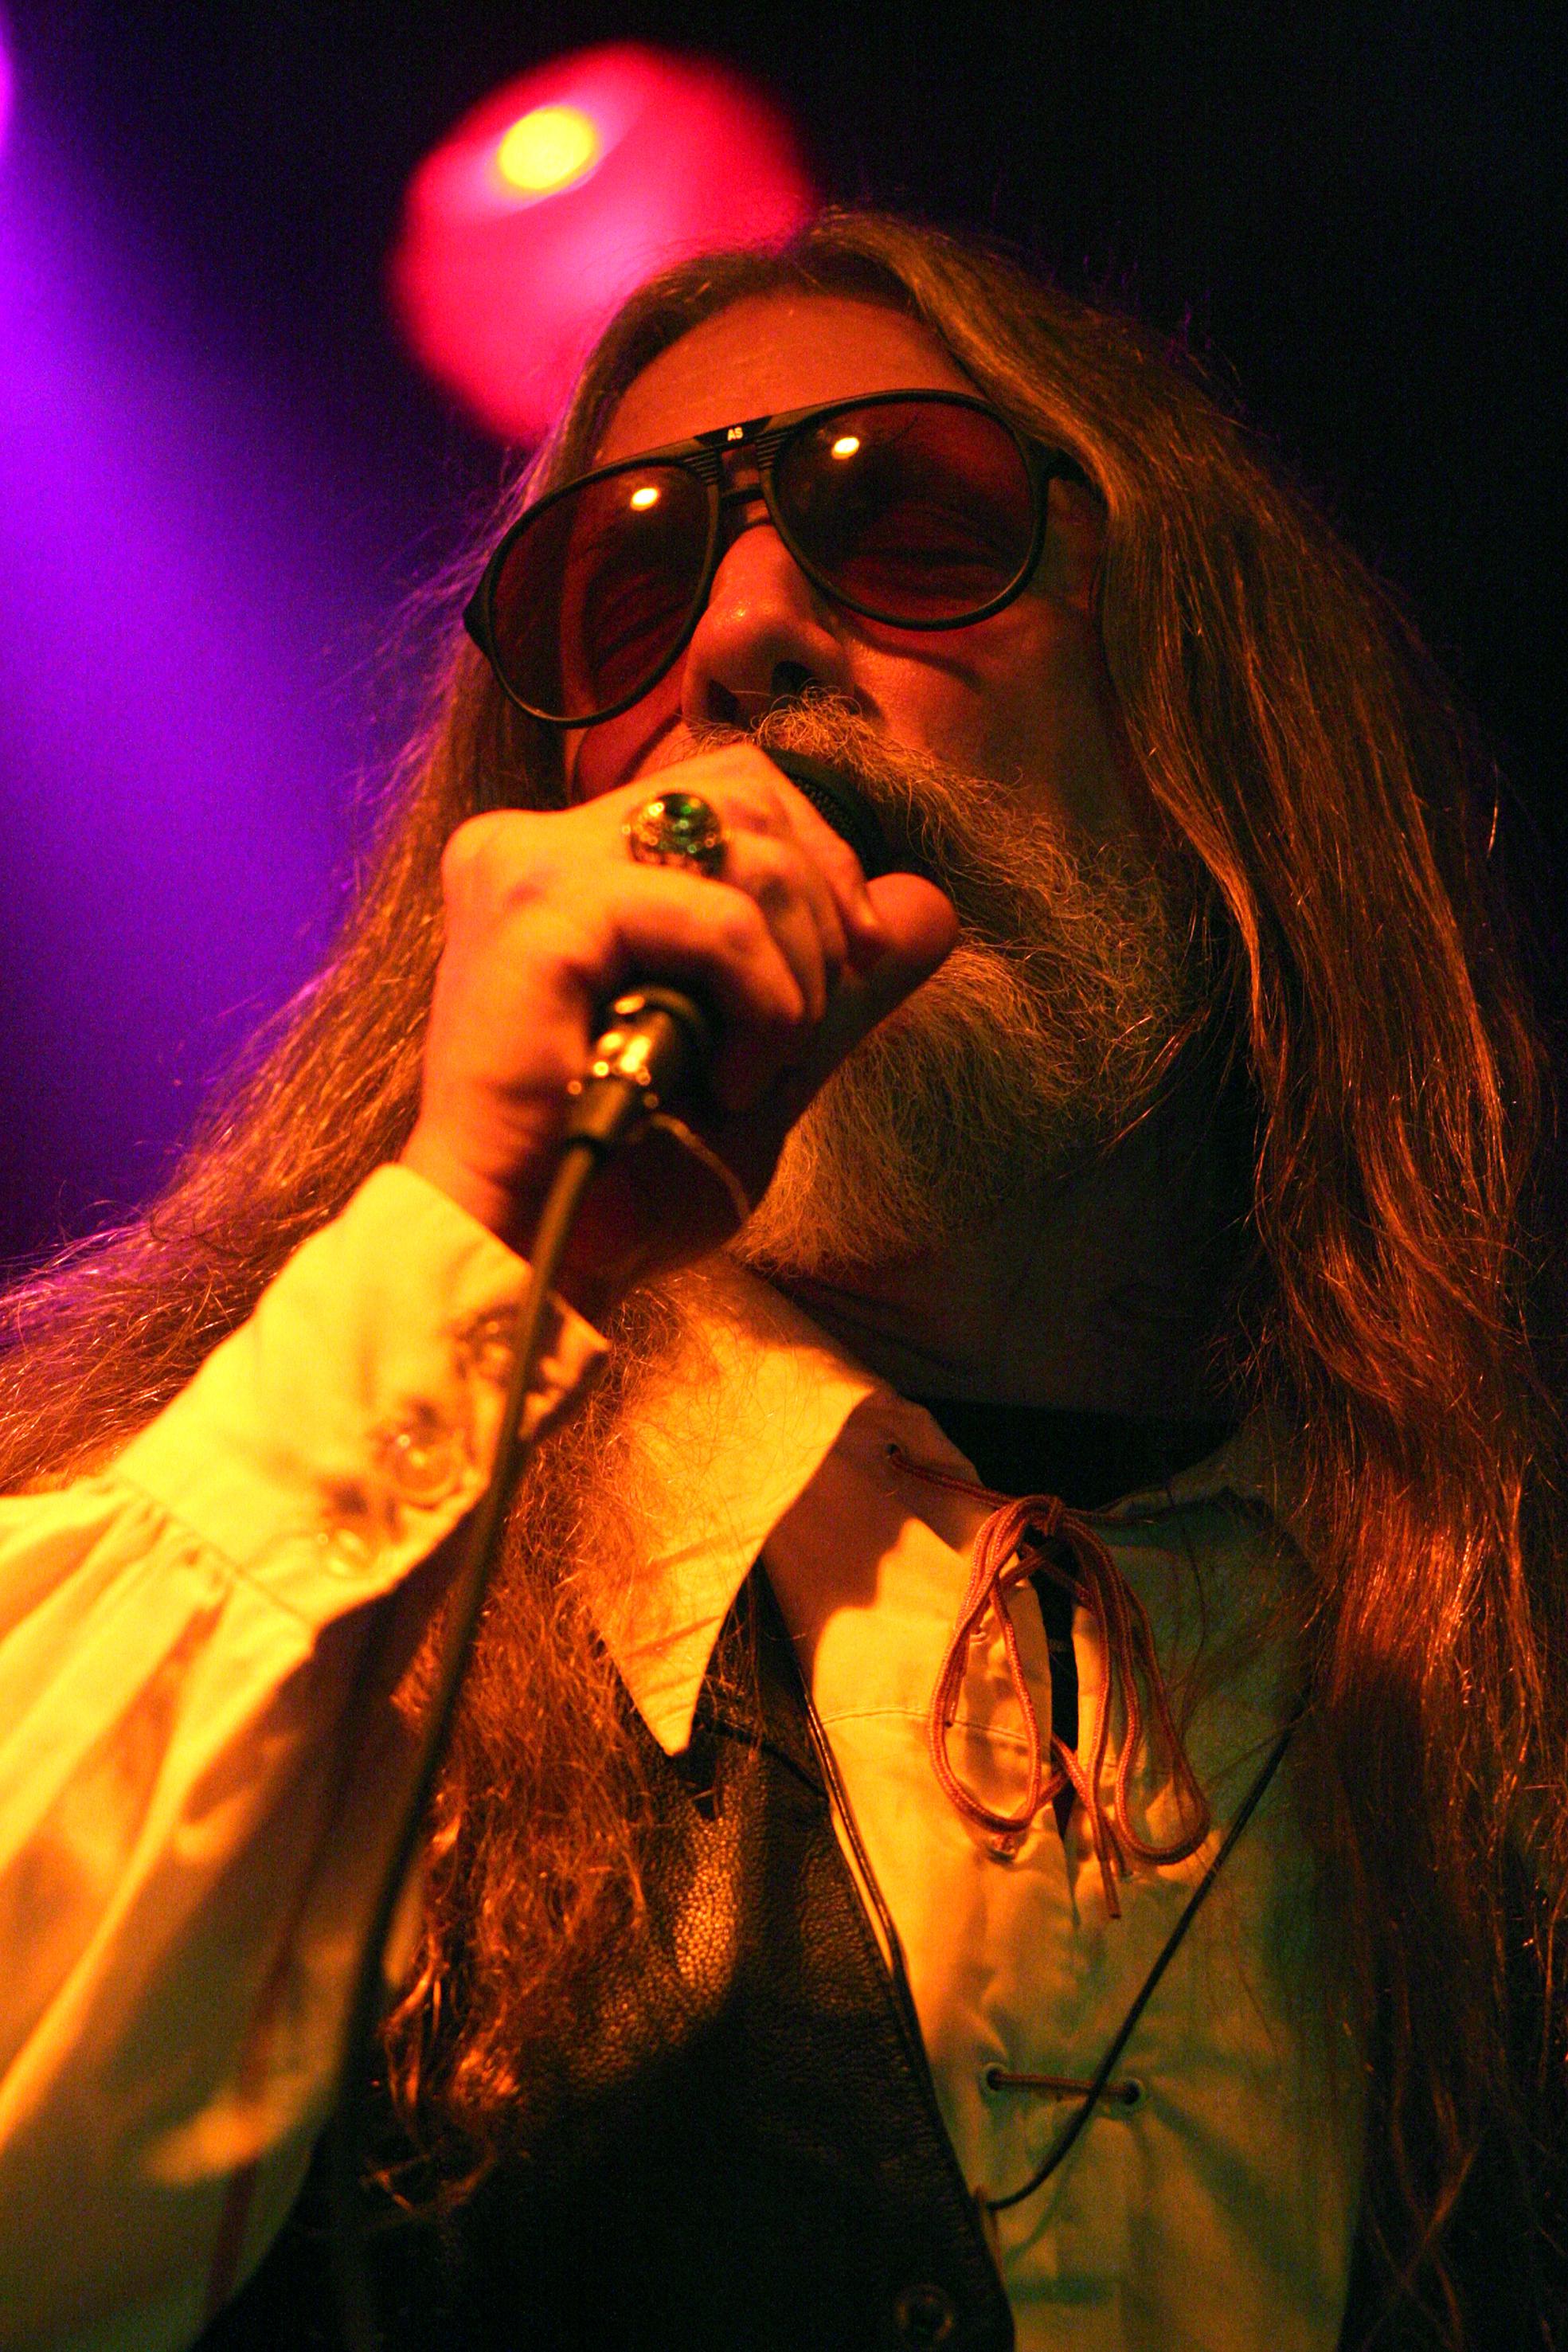 Erik Klingenberg